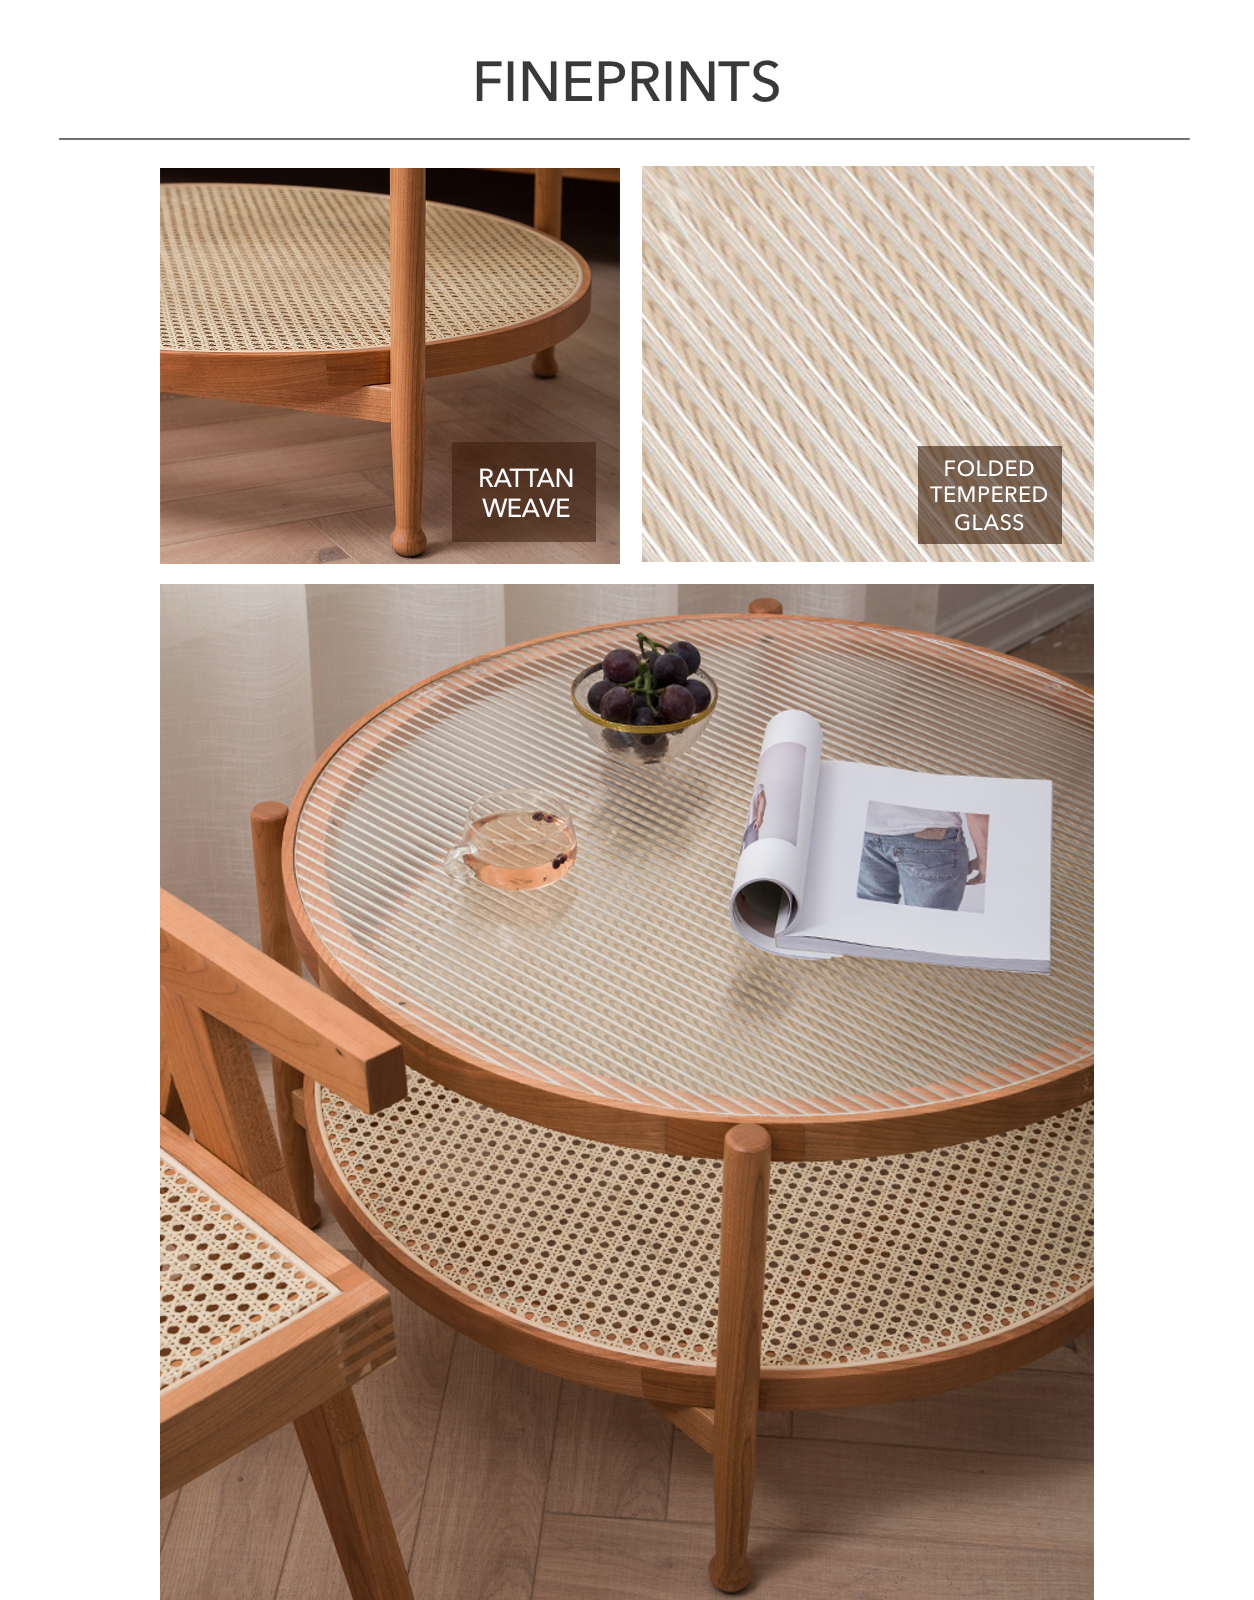 guri_oak_scandinavian_rattan_round_table_800_fineprints_by_born_in_colour